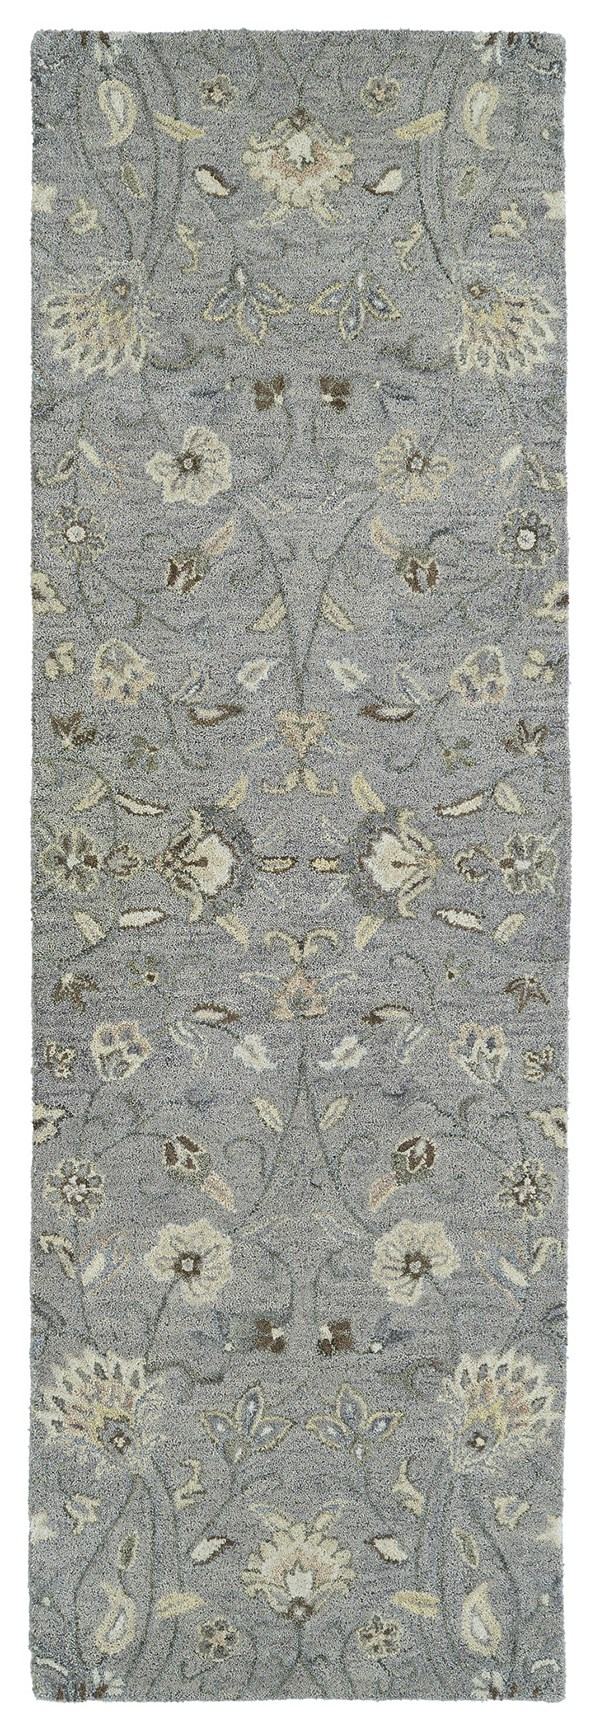 Grey, Ivory, Beige (75) Traditional / Oriental Area Rug